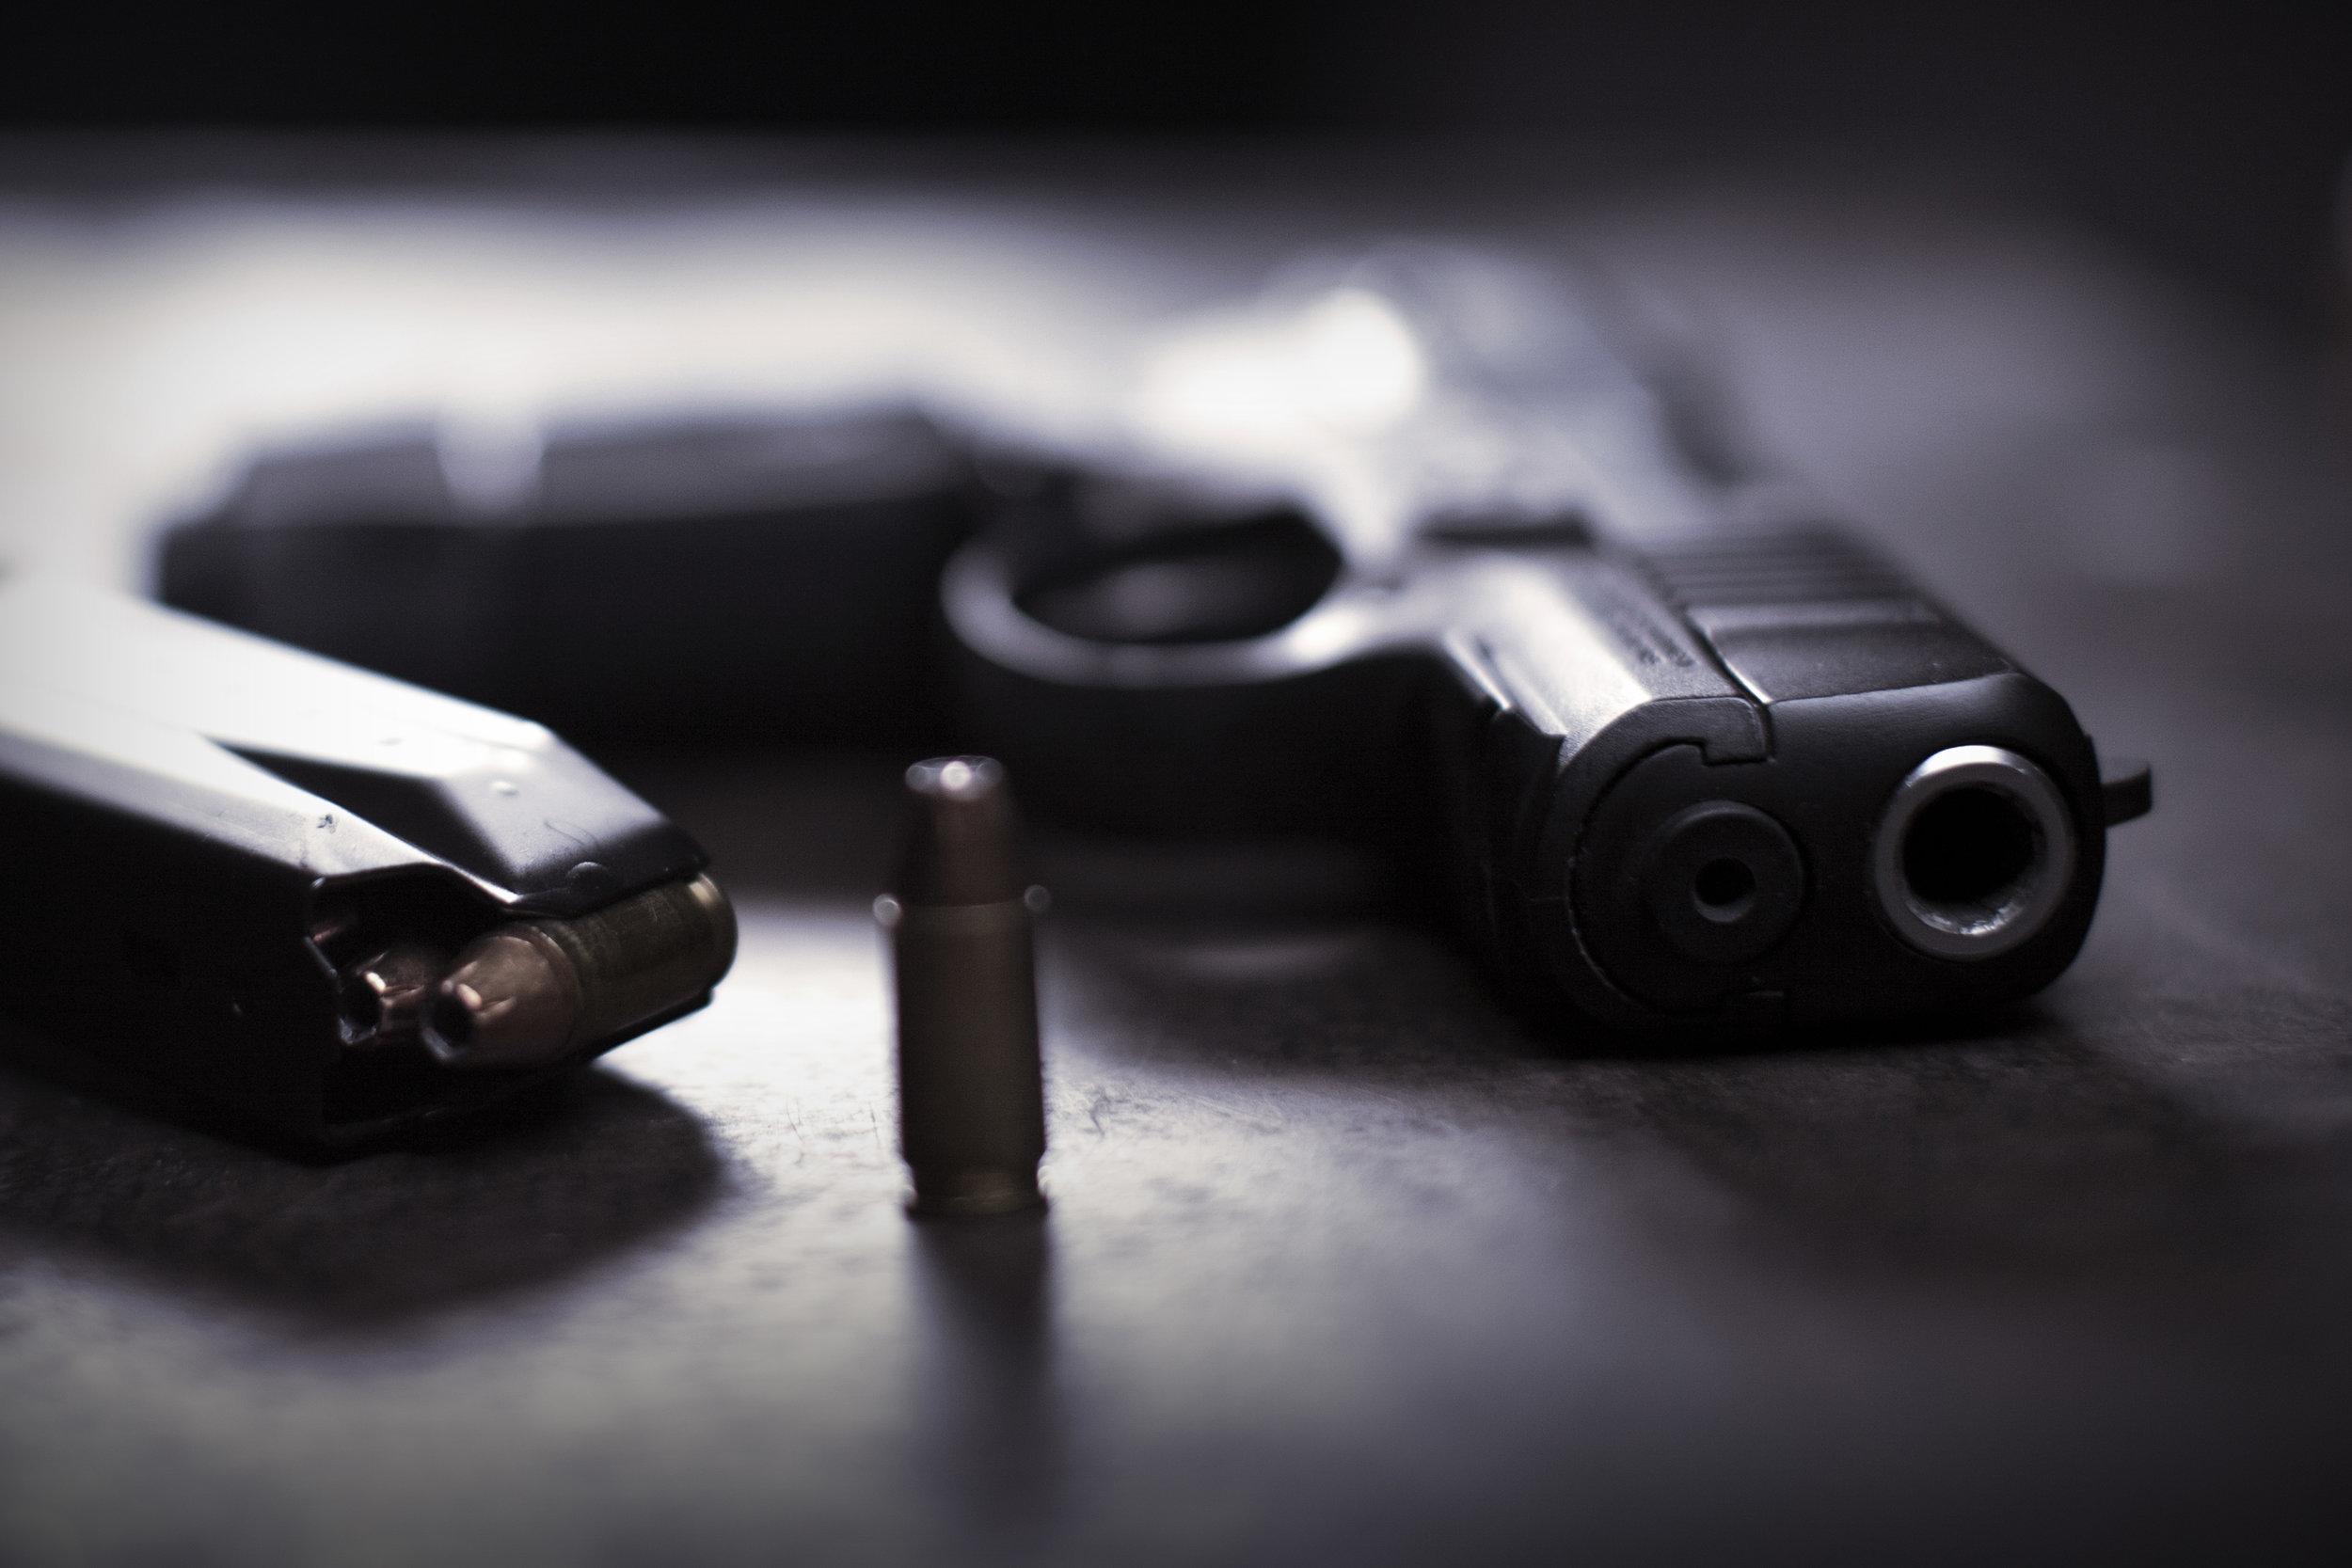 guns2.jpg